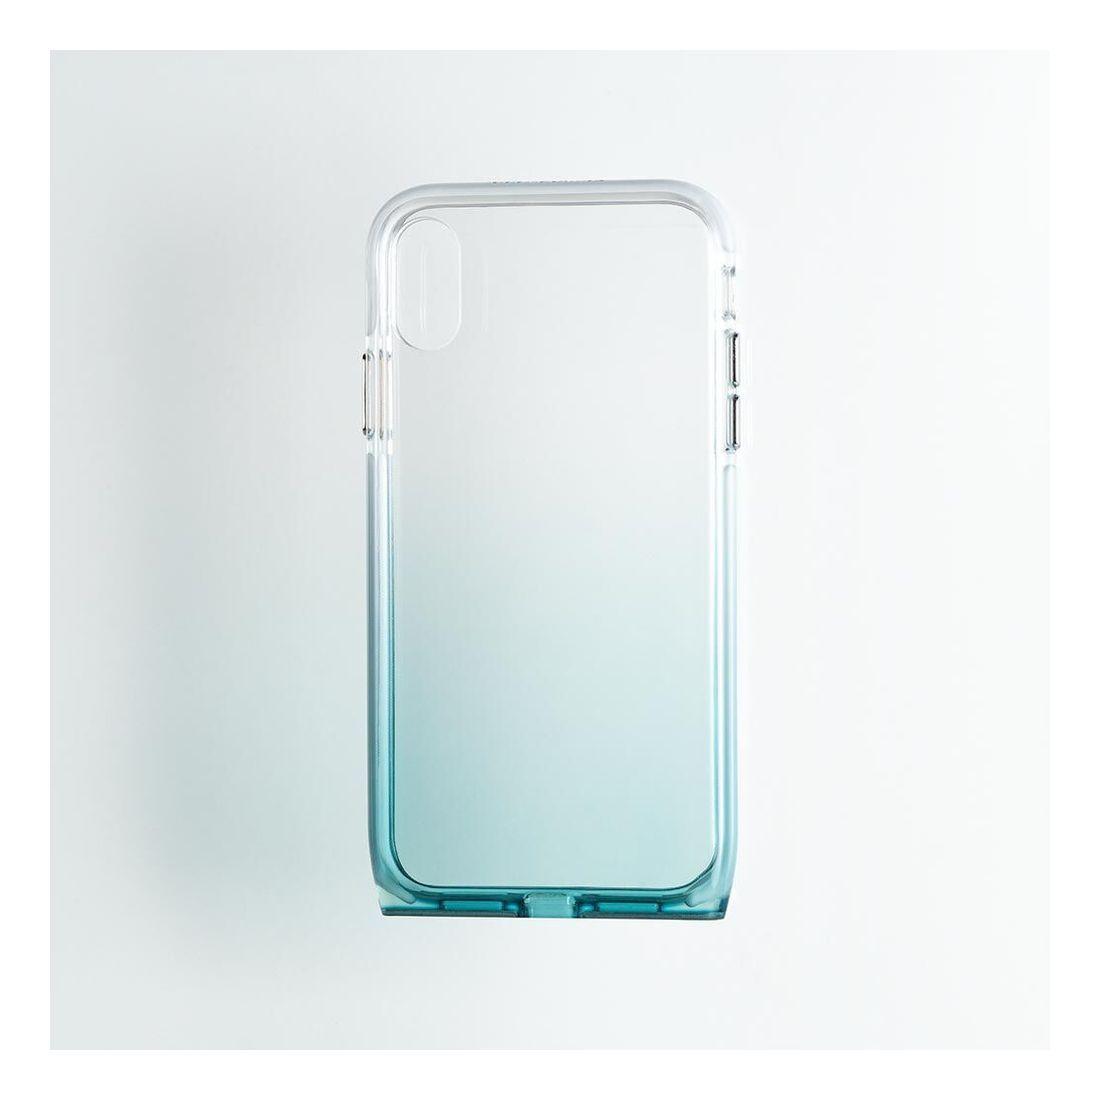 BodyGuardz Harmony Lucky Case Clear/Mint for iPhone XS Max